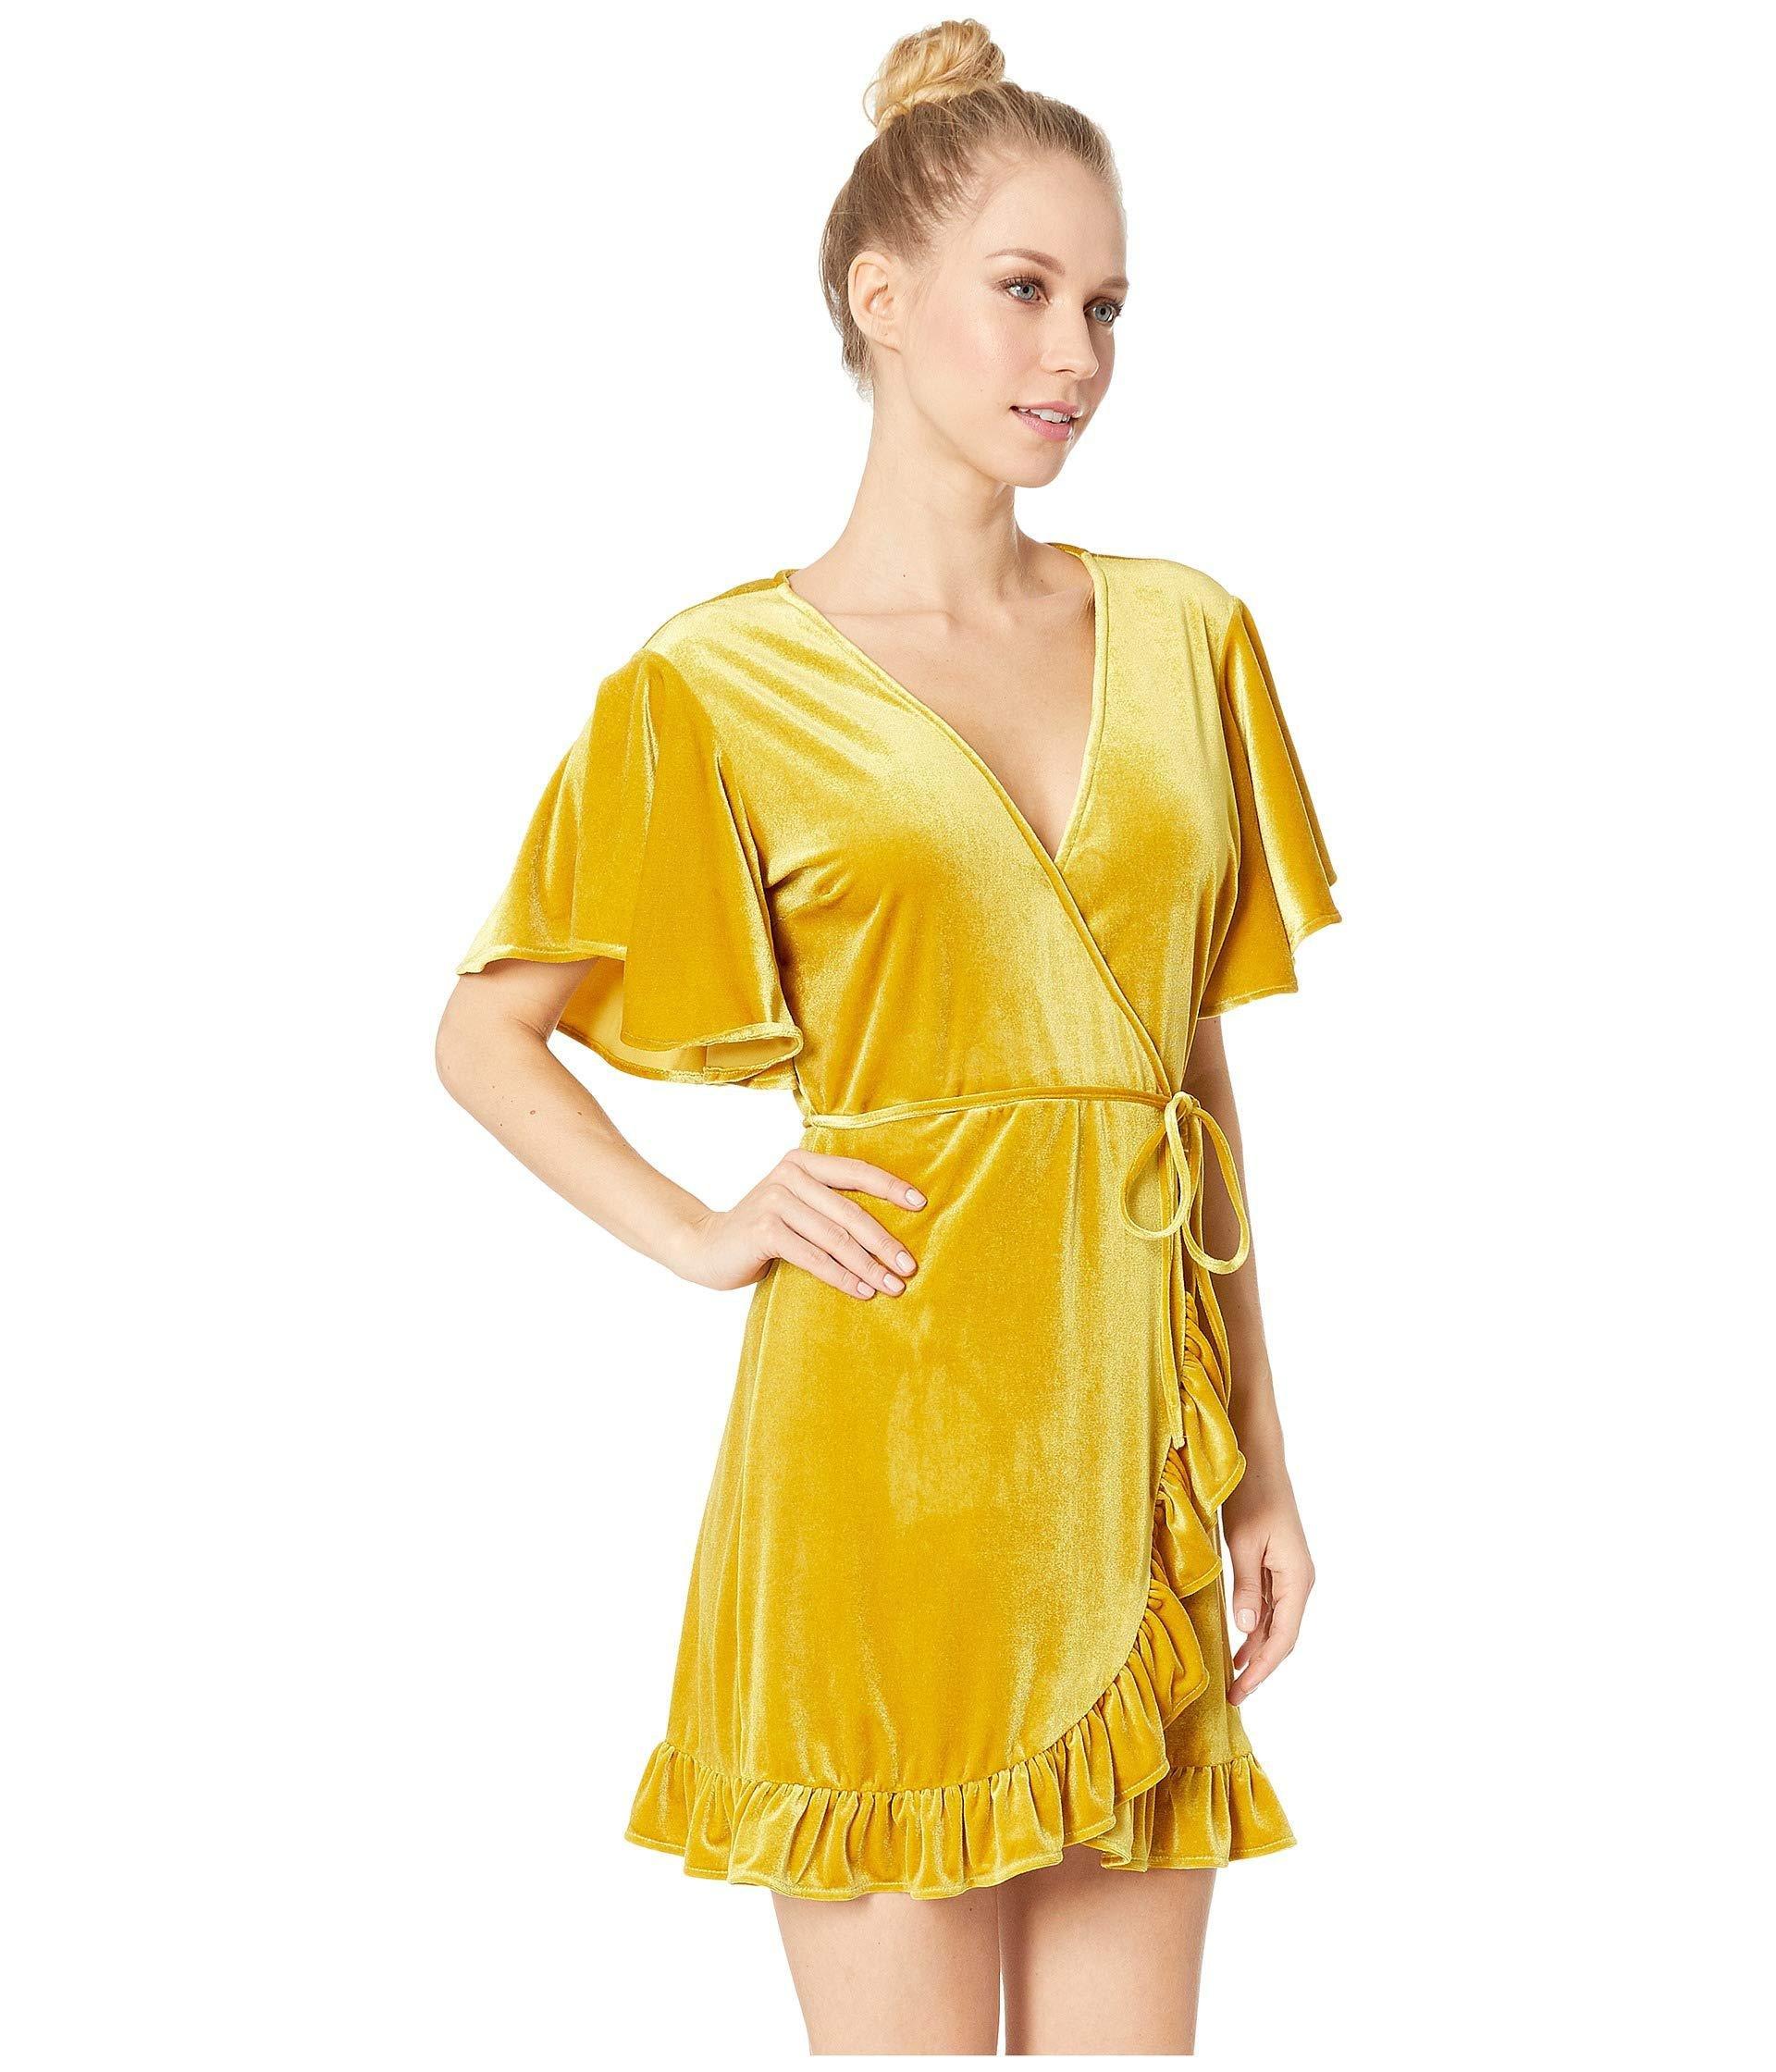 436189794c Jack BB Dakota - Yellow West Village Velvet Wrap Dress - Lyst. View  fullscreen